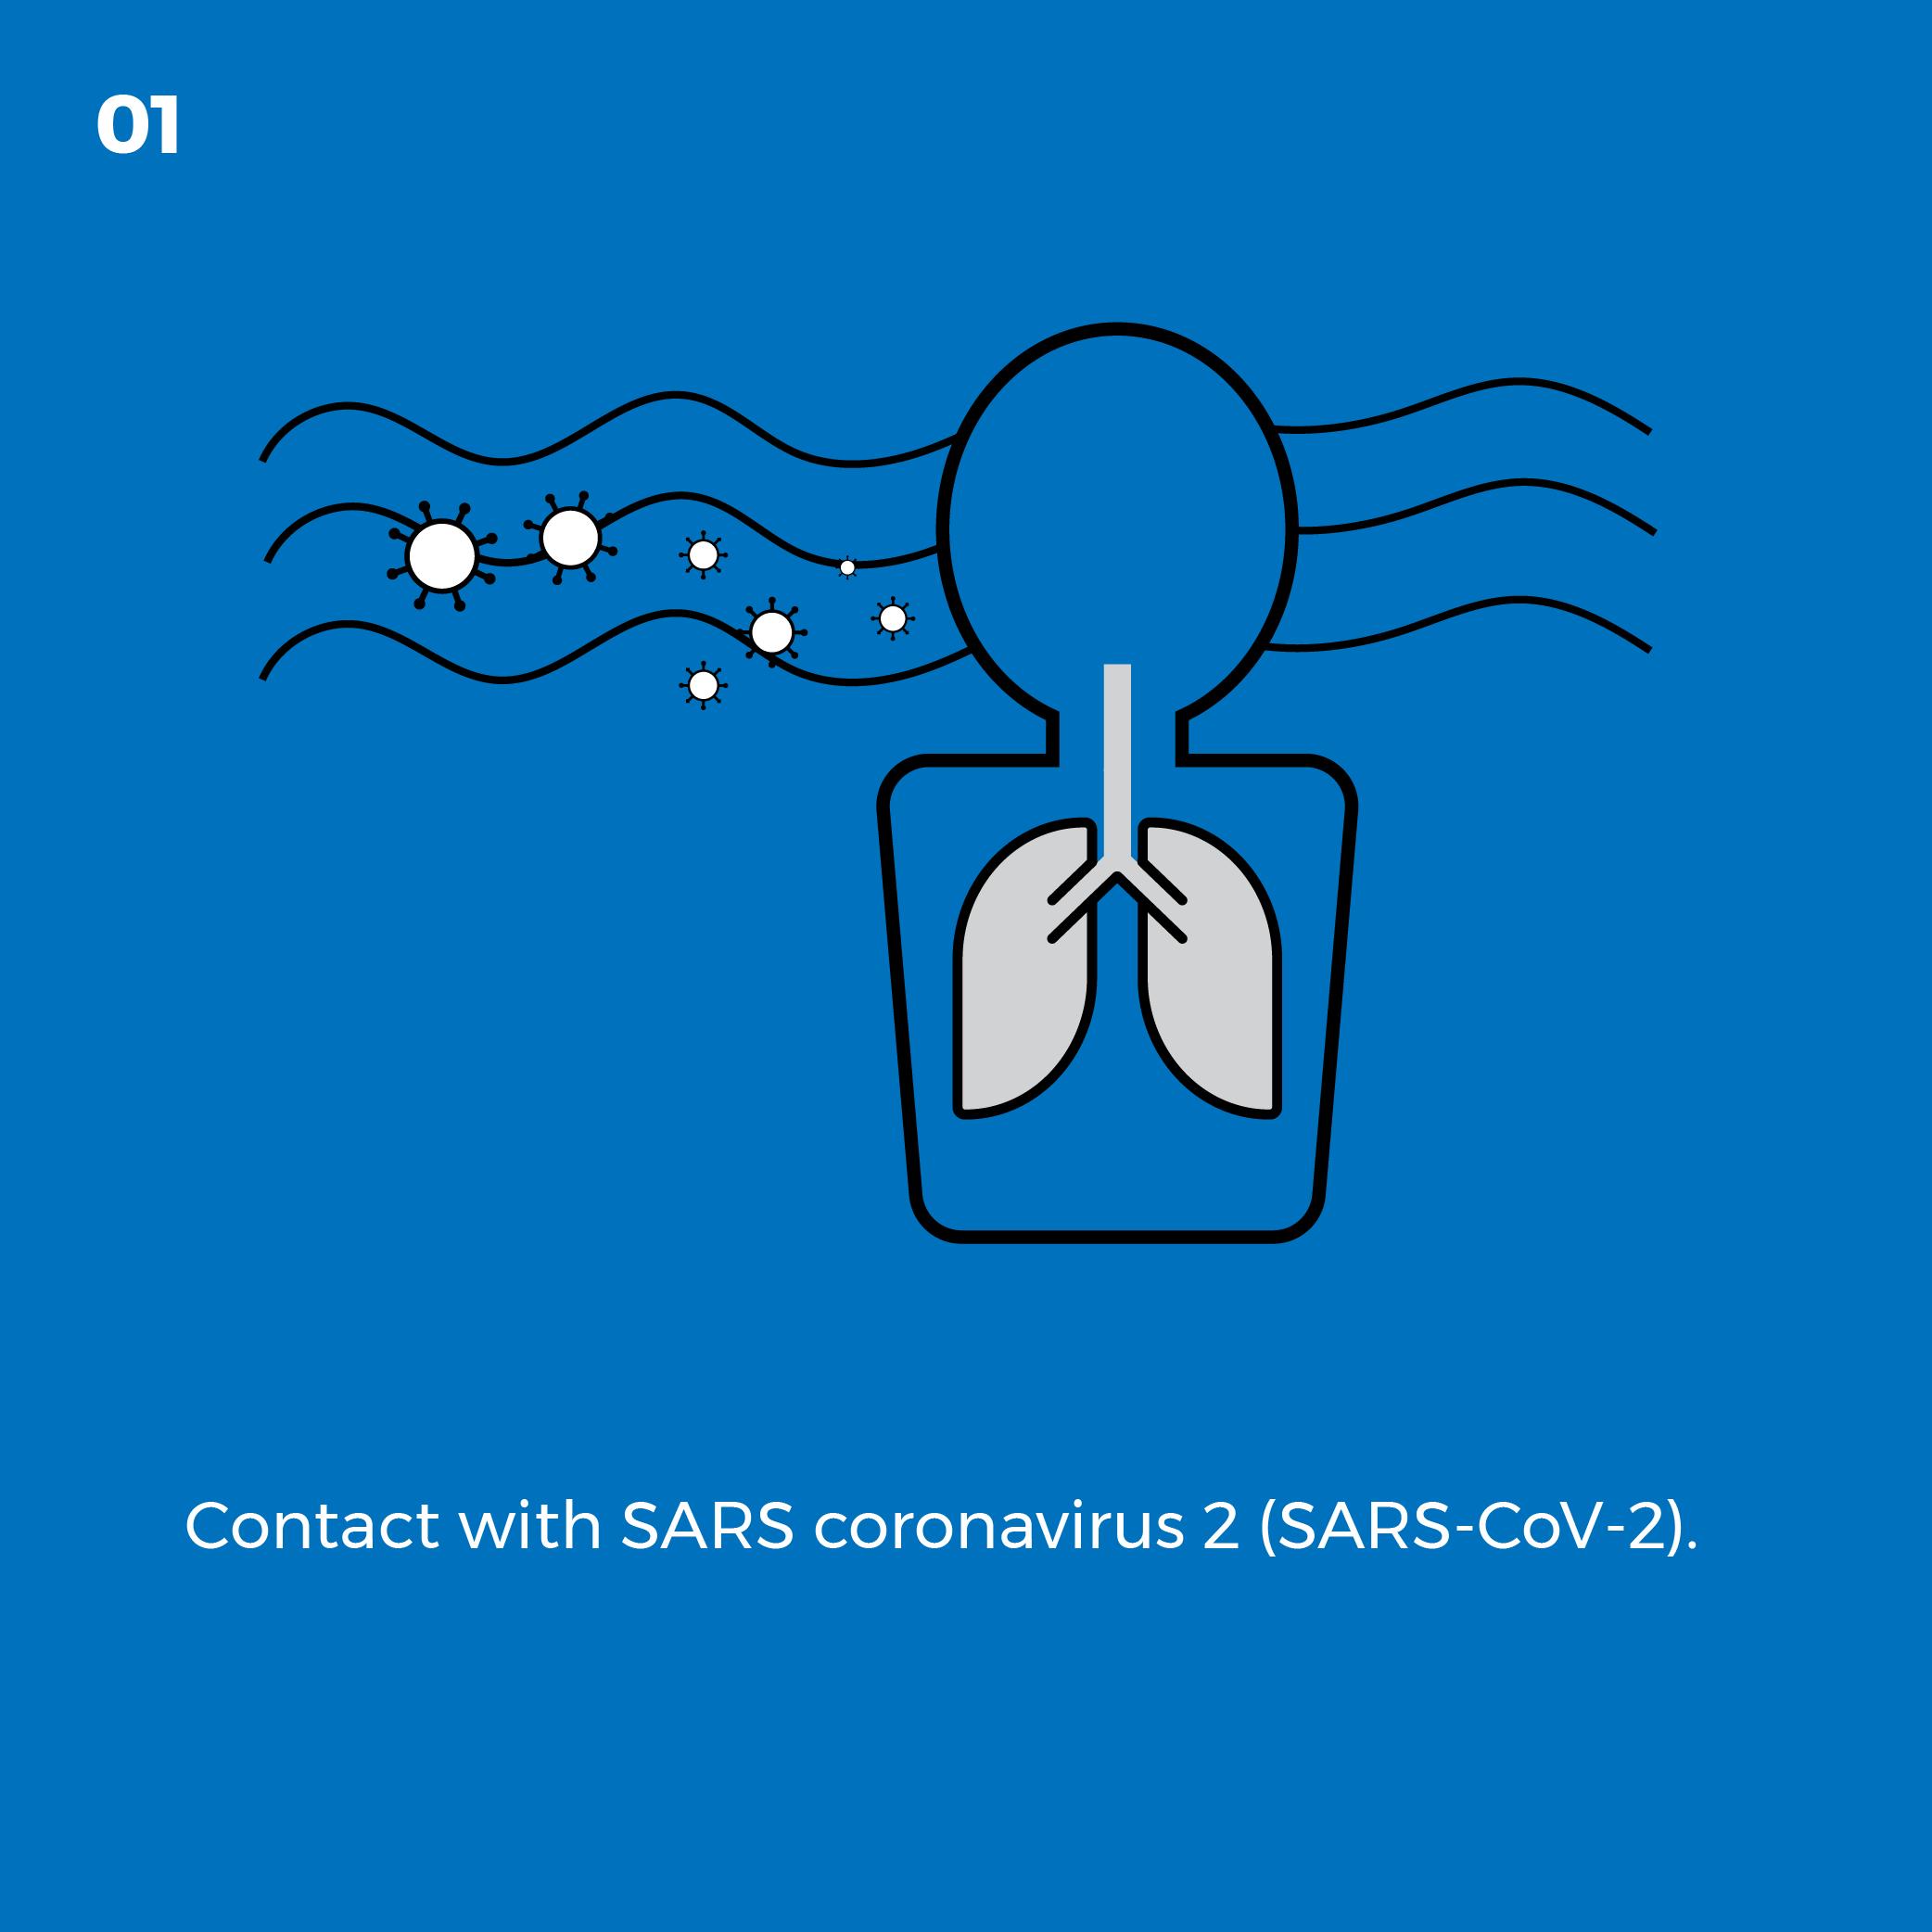 Contact with SARS coronavirus 2 (SARS-CoV-2)